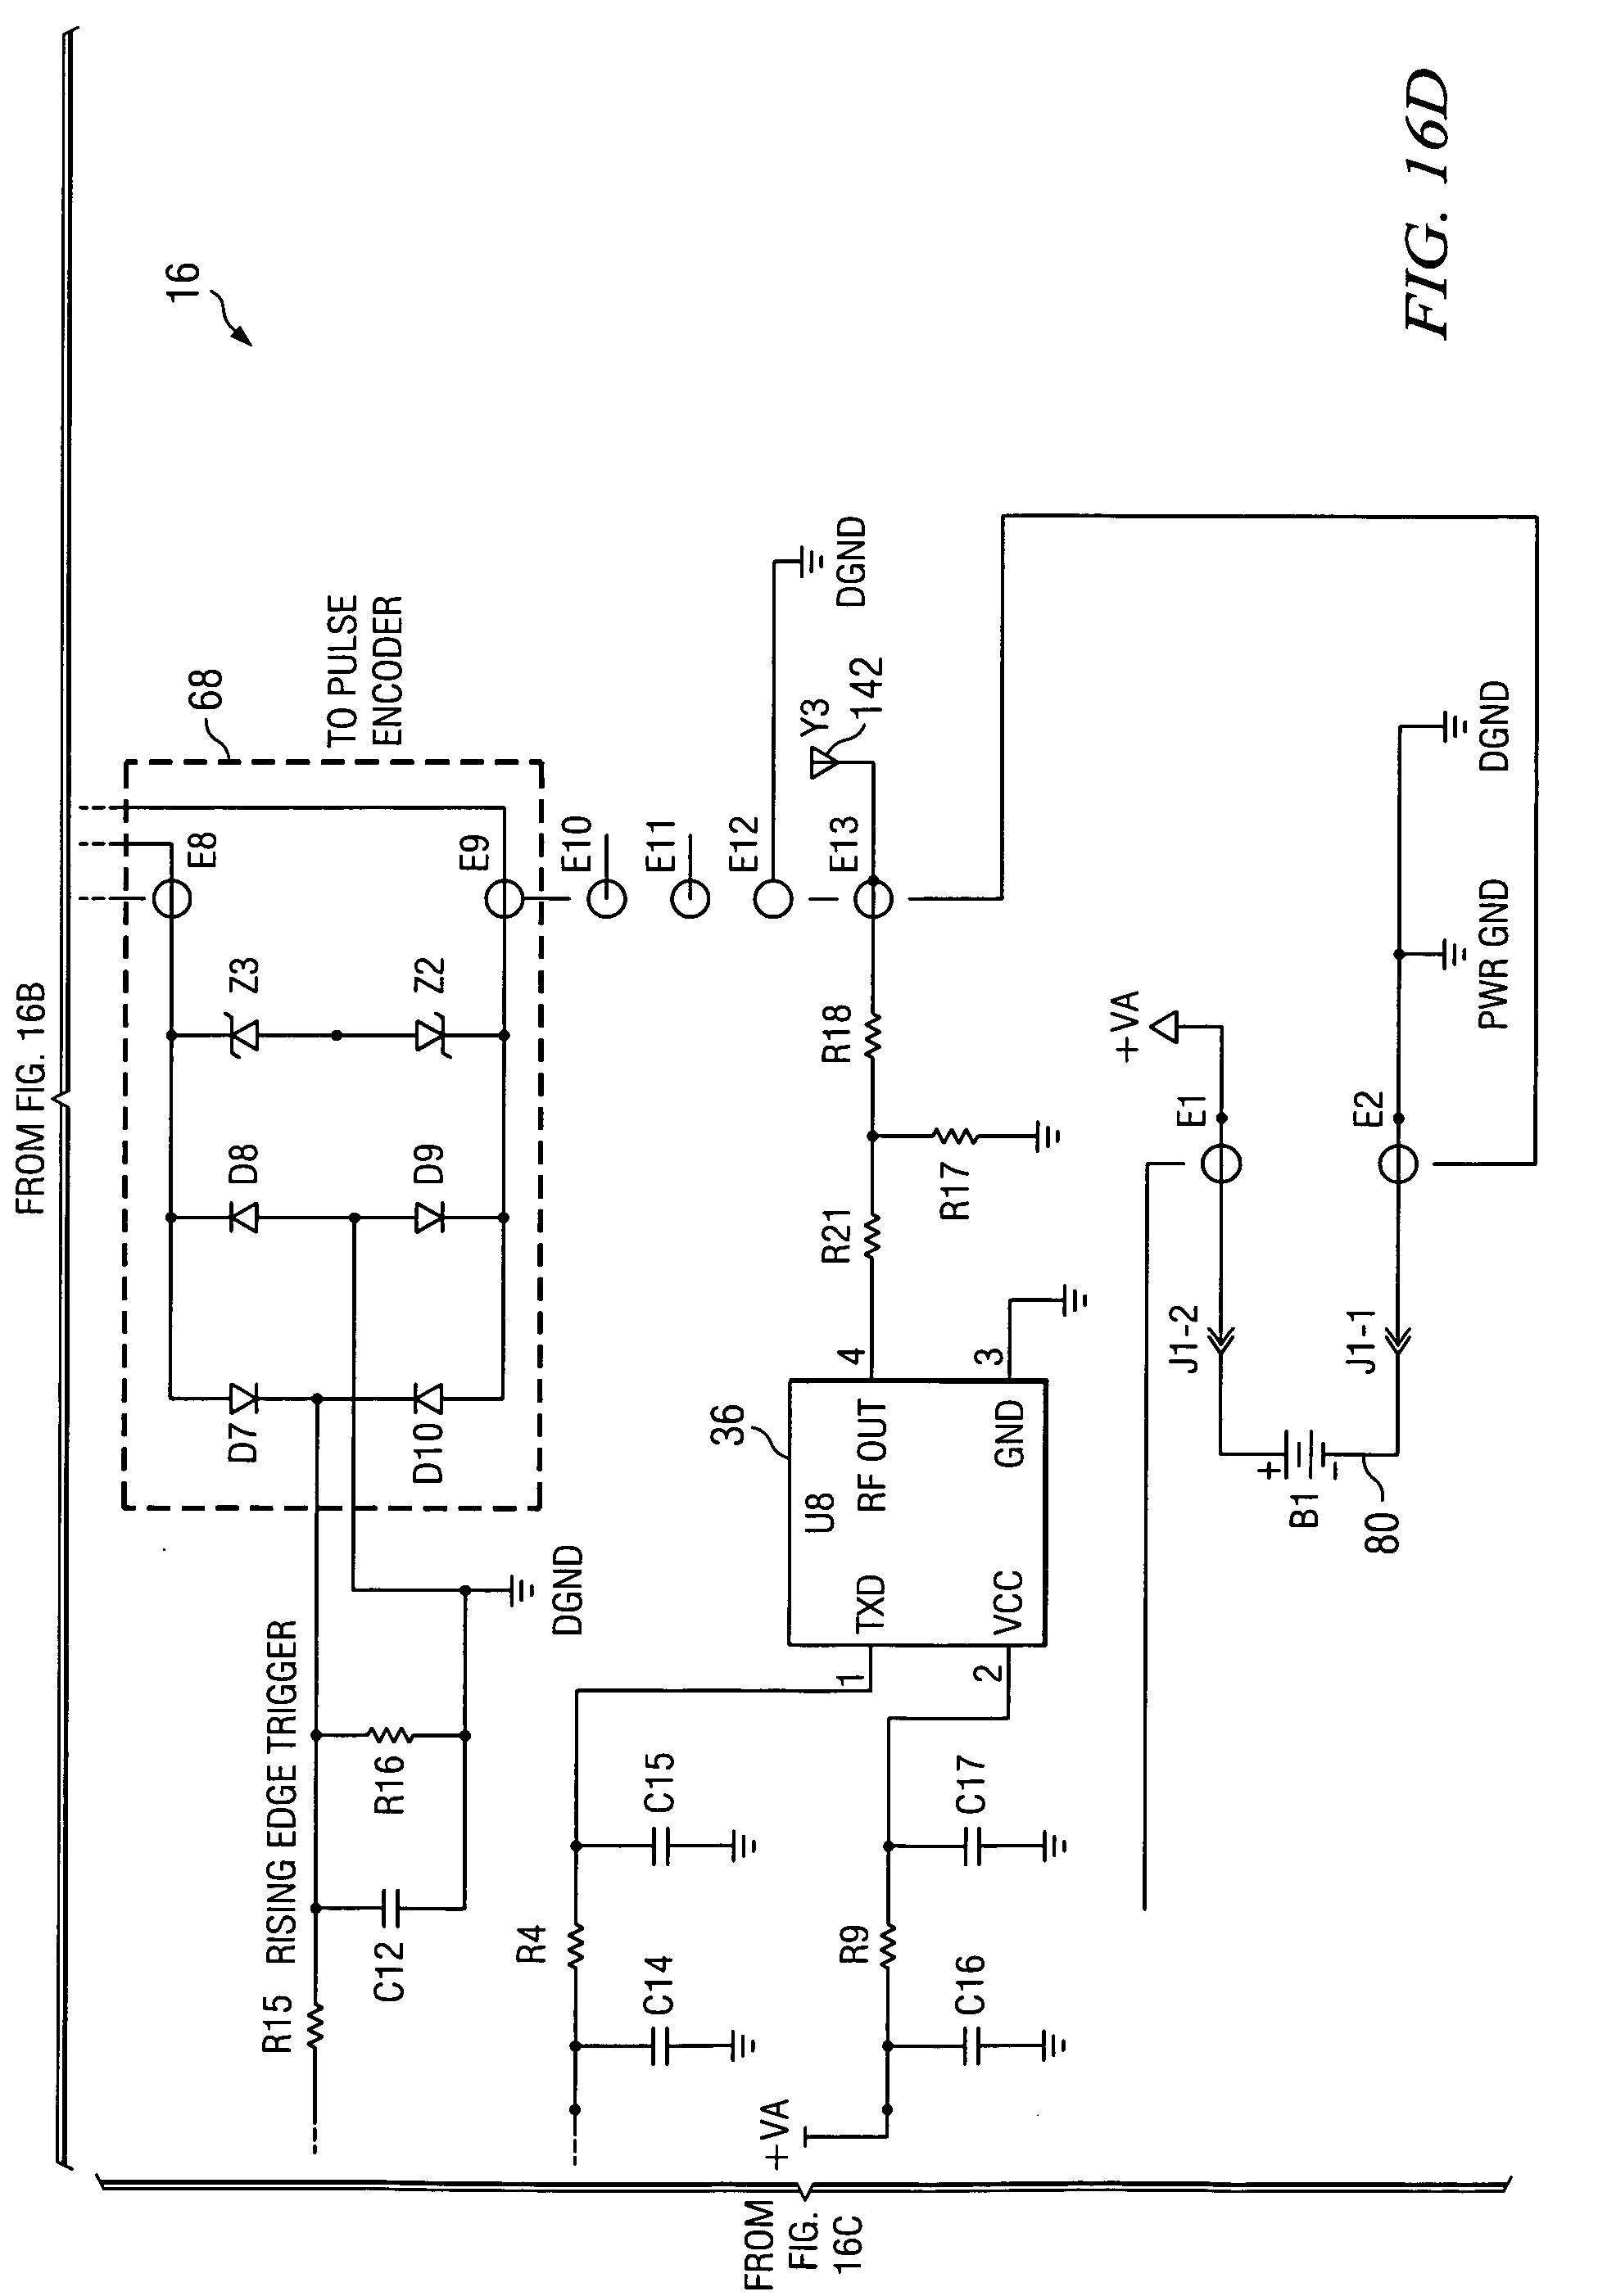 patente us20060158347